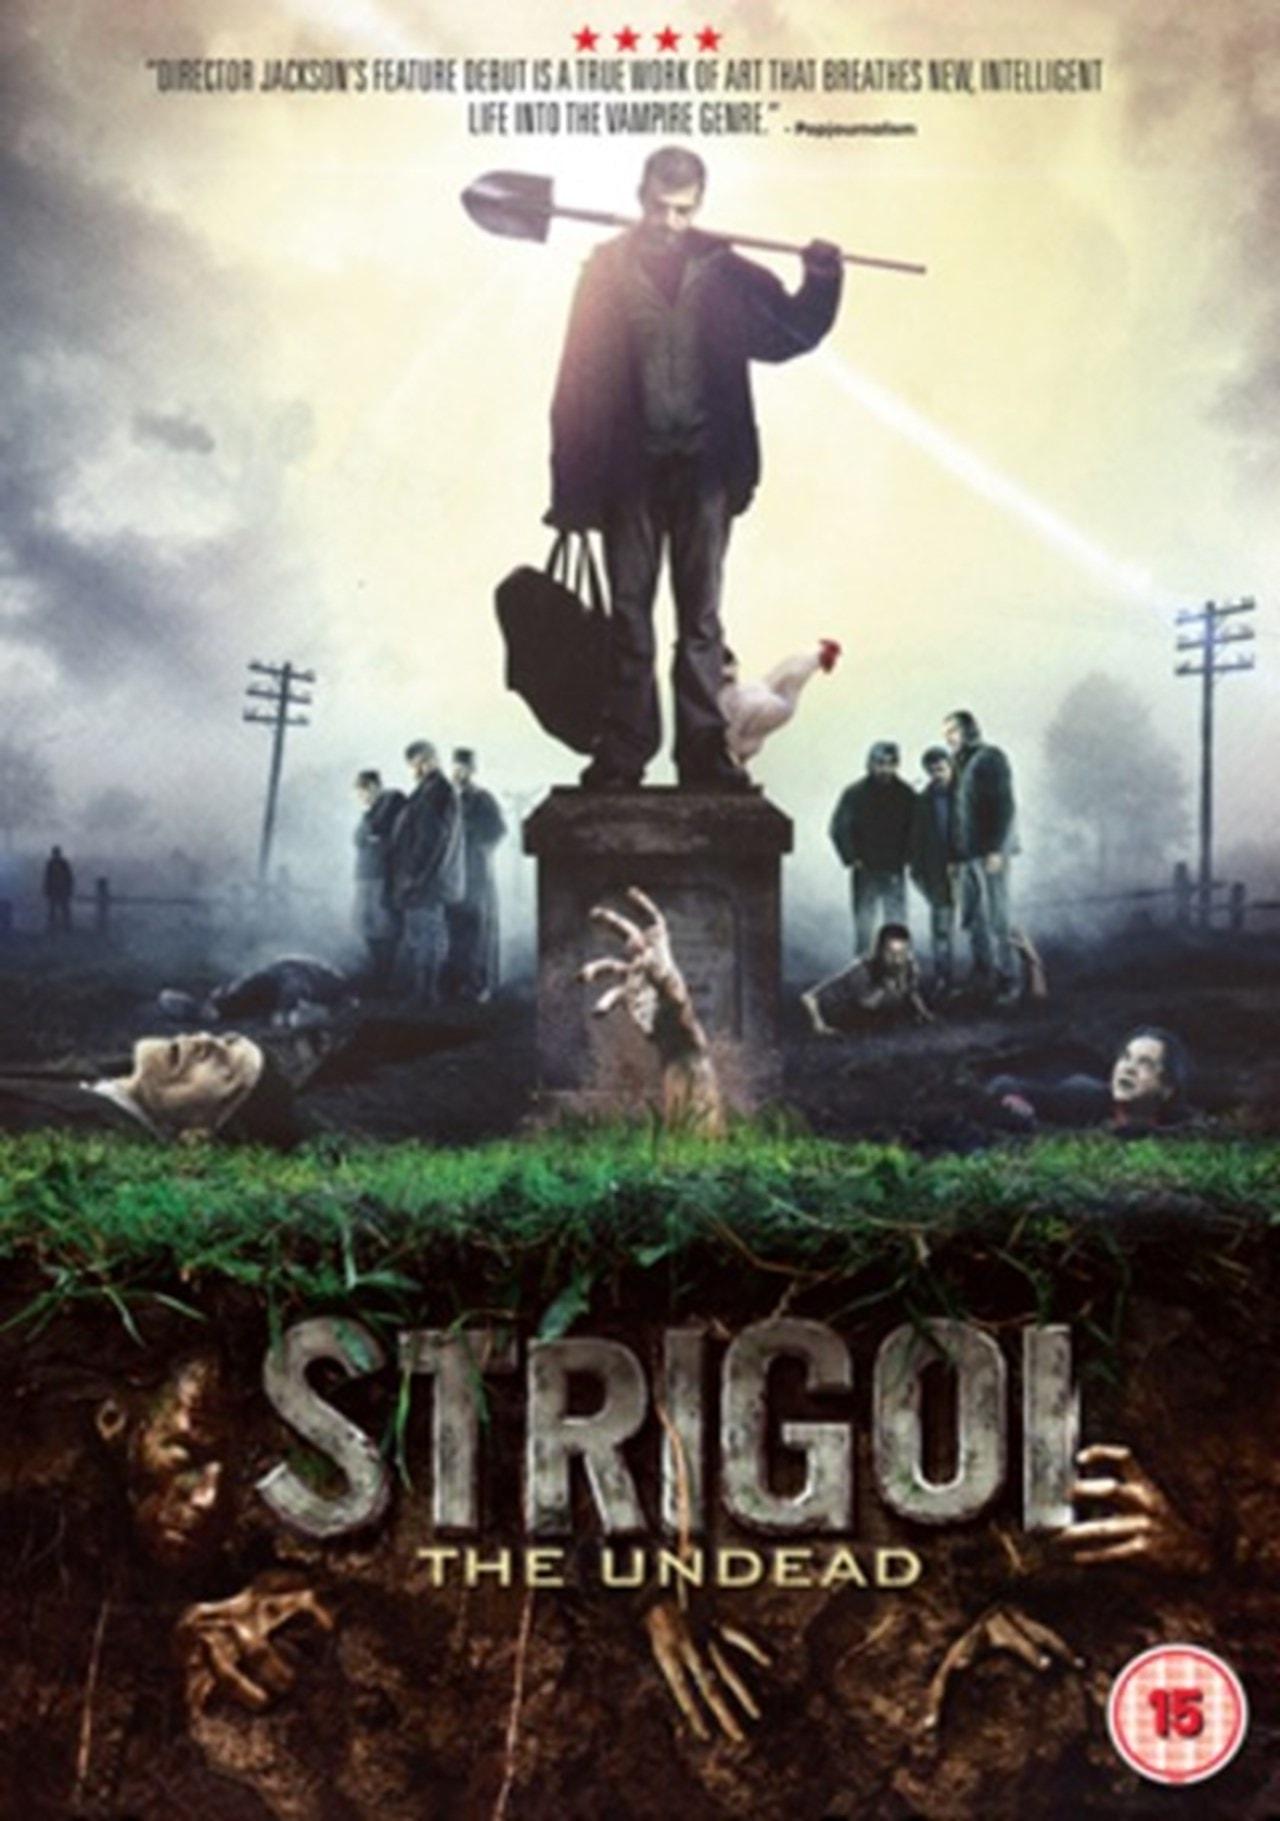 Strigoi - The Undead - 1